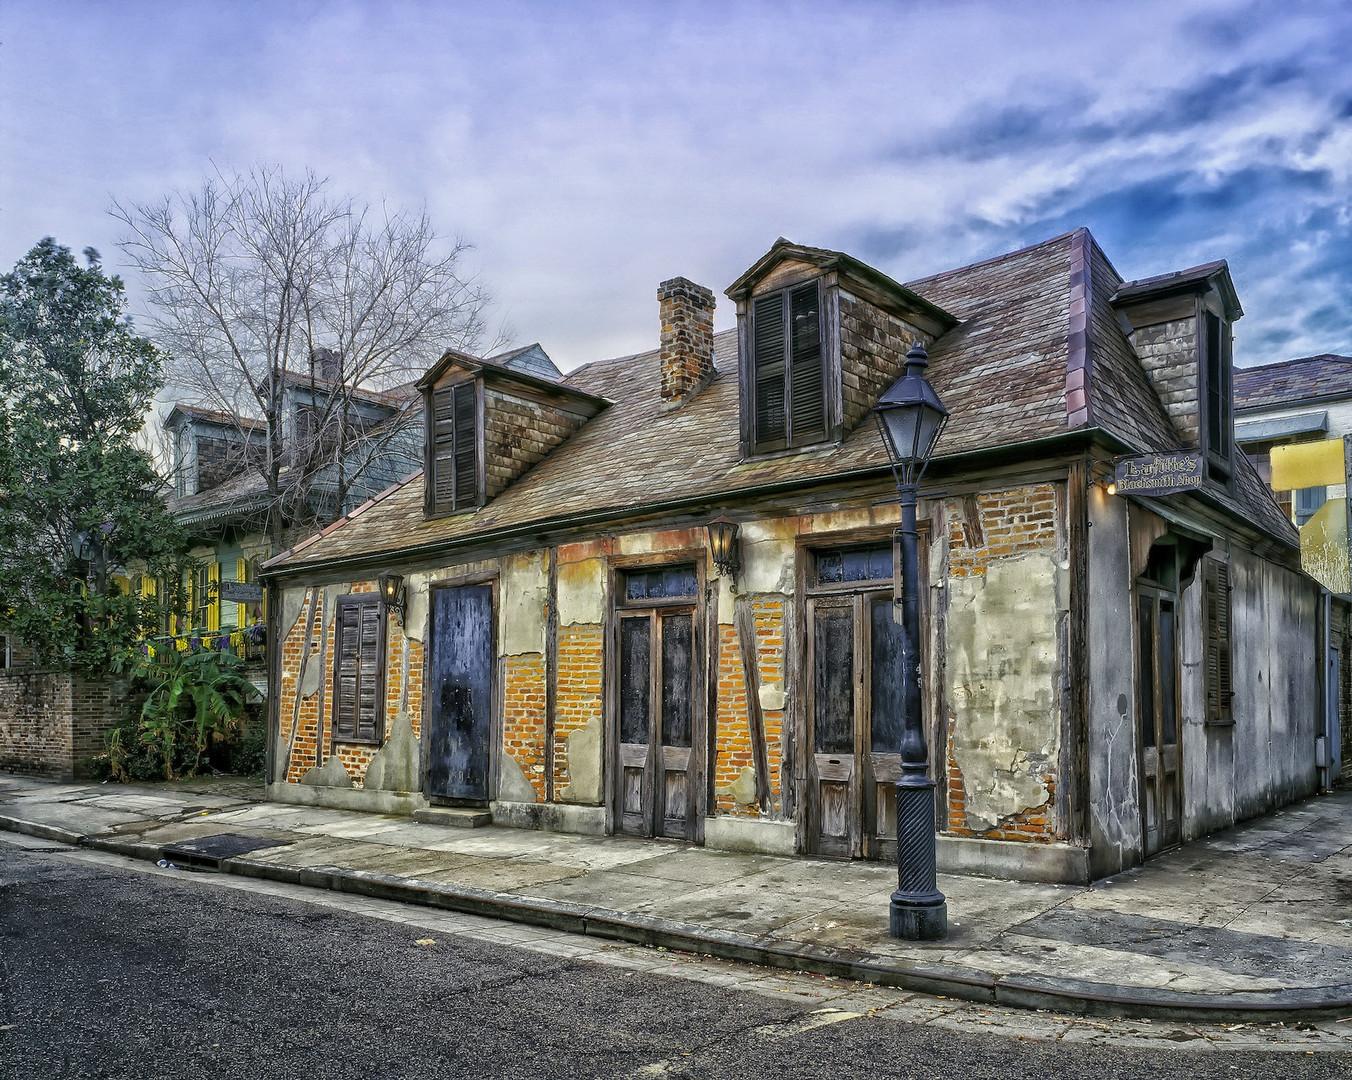 lafittes-blacksmith-shop-404201_1920.jpg